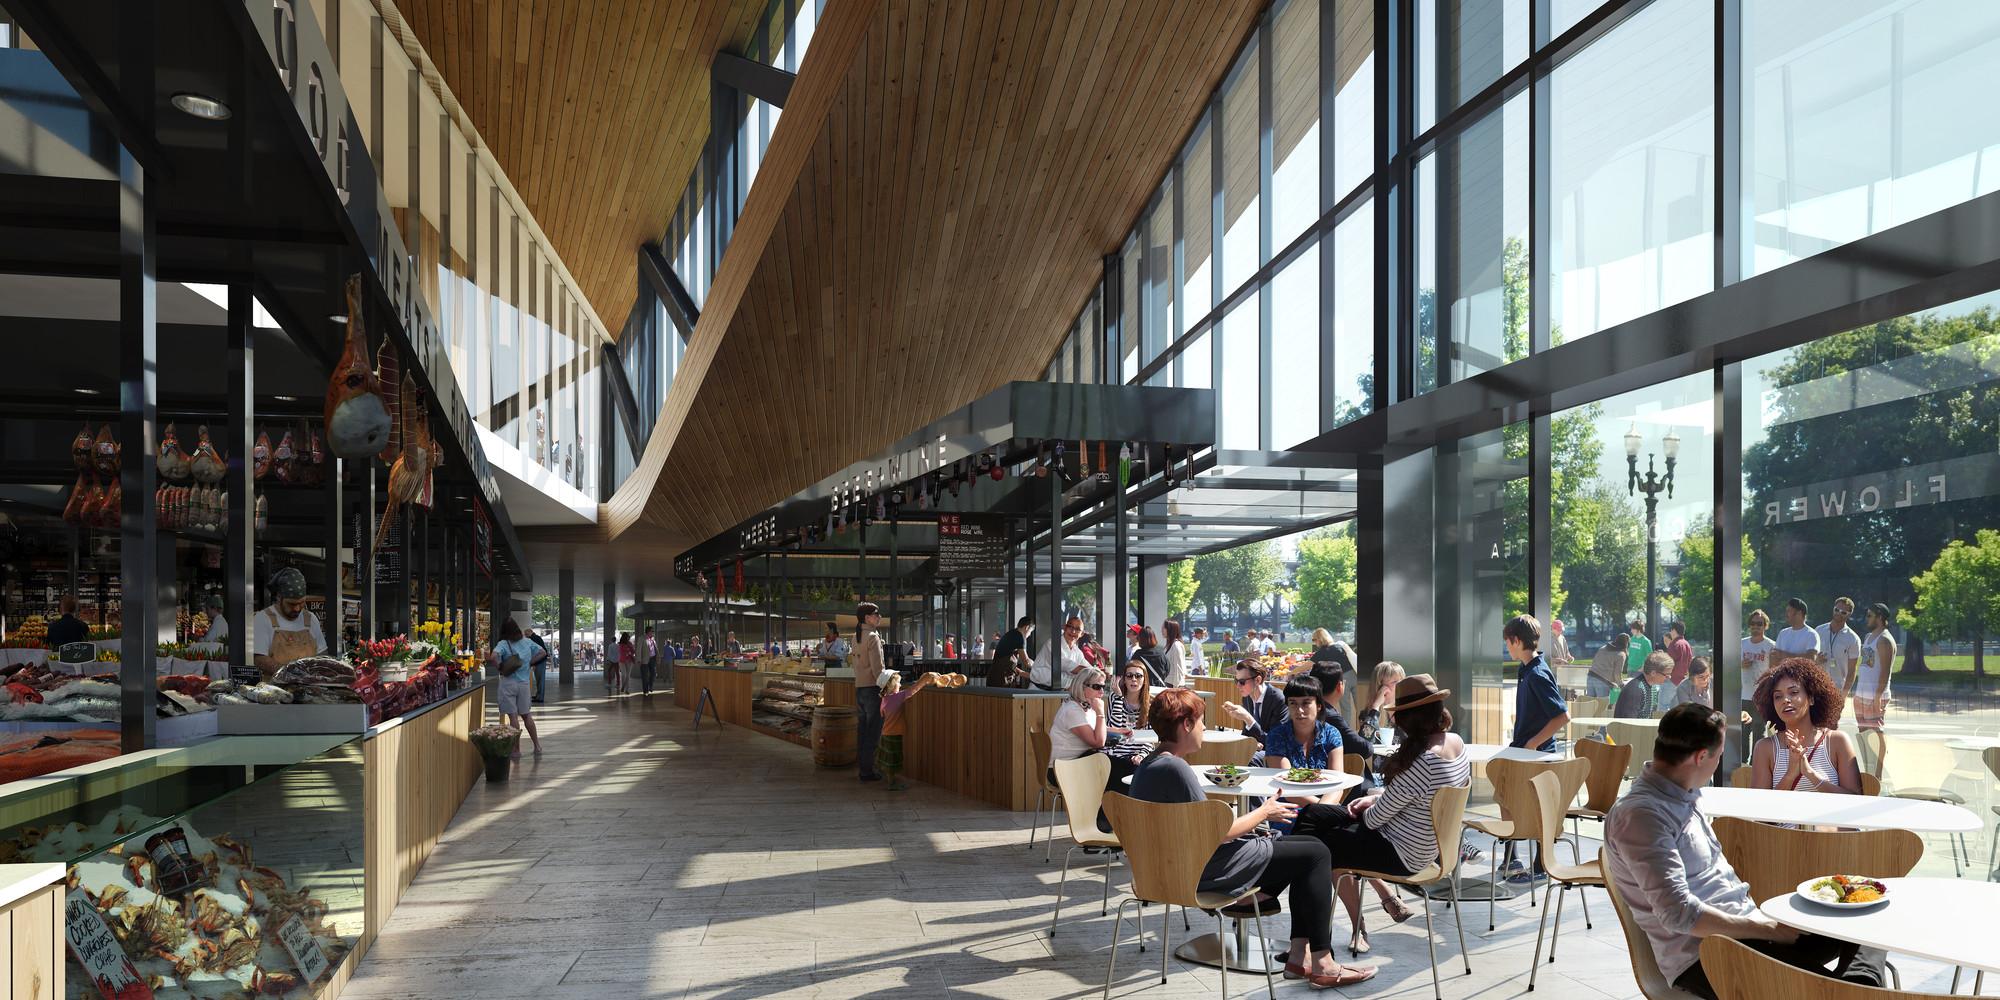 Gallery of sn hetta designs new public market for portland 3 for Portland oregon fish market